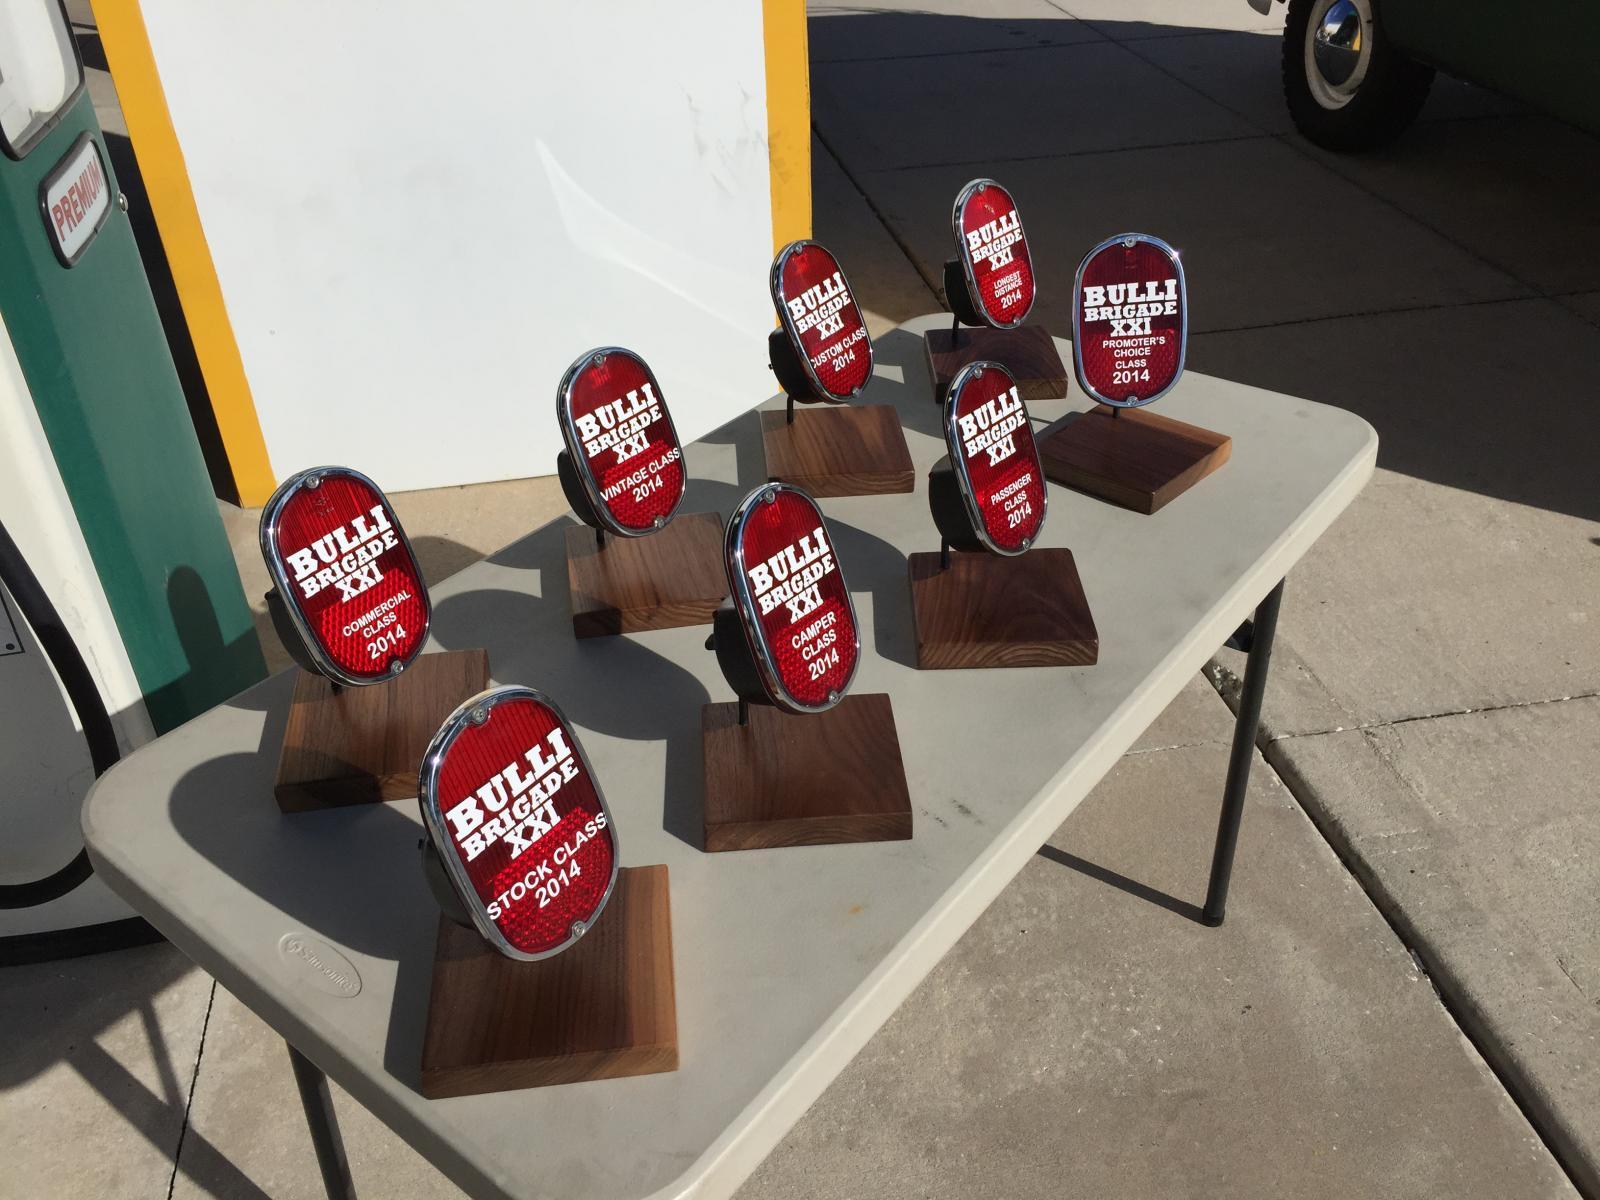 Bulli Brigade trophies